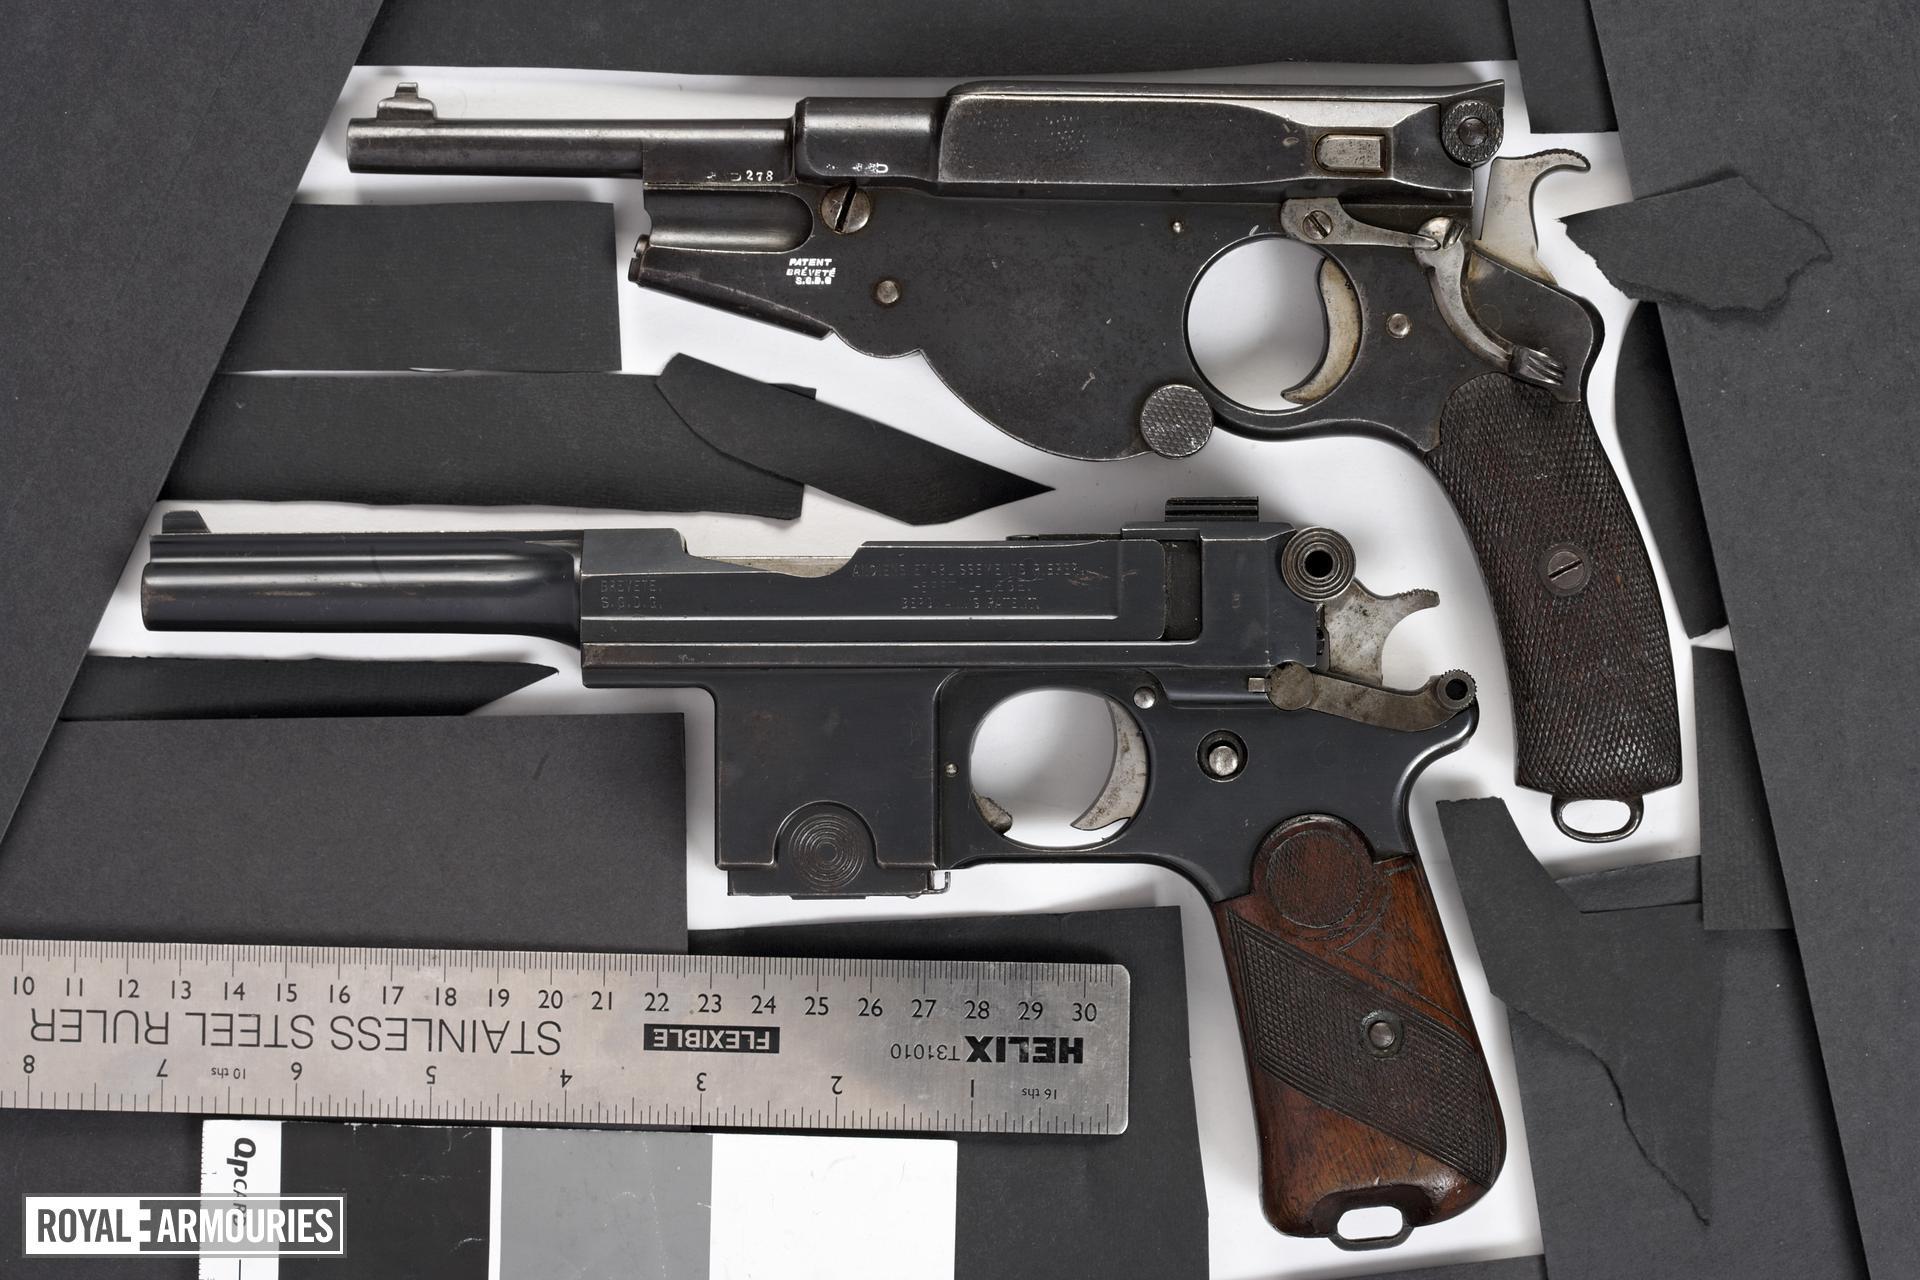 Centrefire self-loading pistol - Bergmann Bayard Model 1910